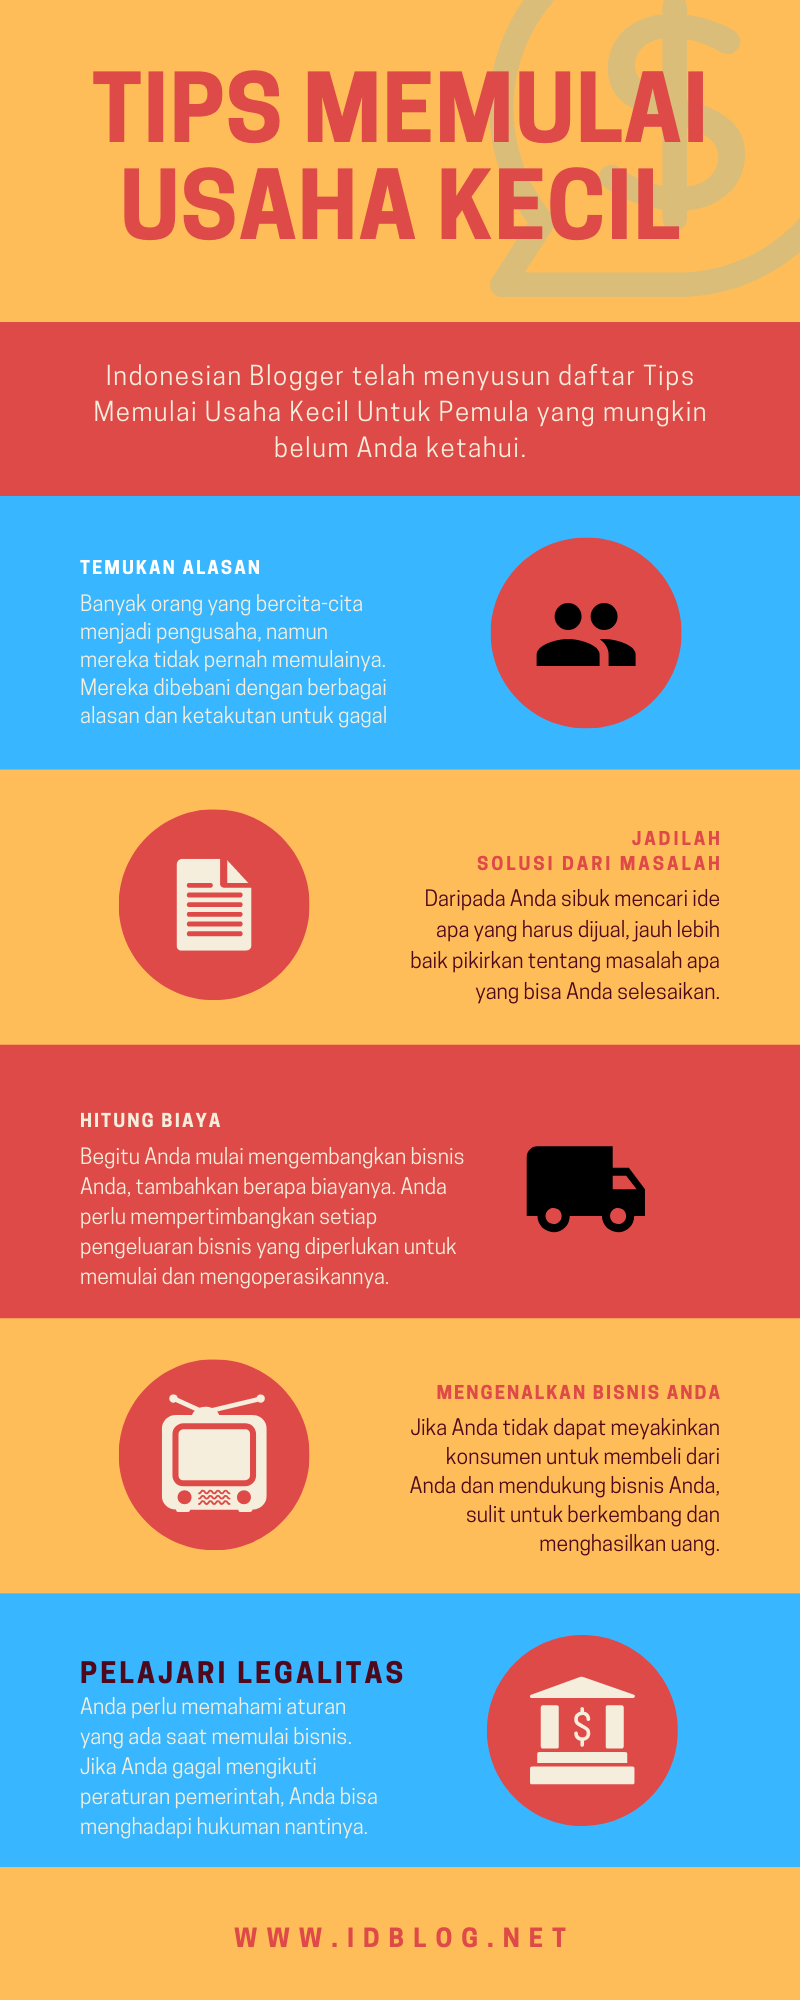 Tips Memulai Usaha Kecil Untuk Pemula Tips Pengusaha Belajar